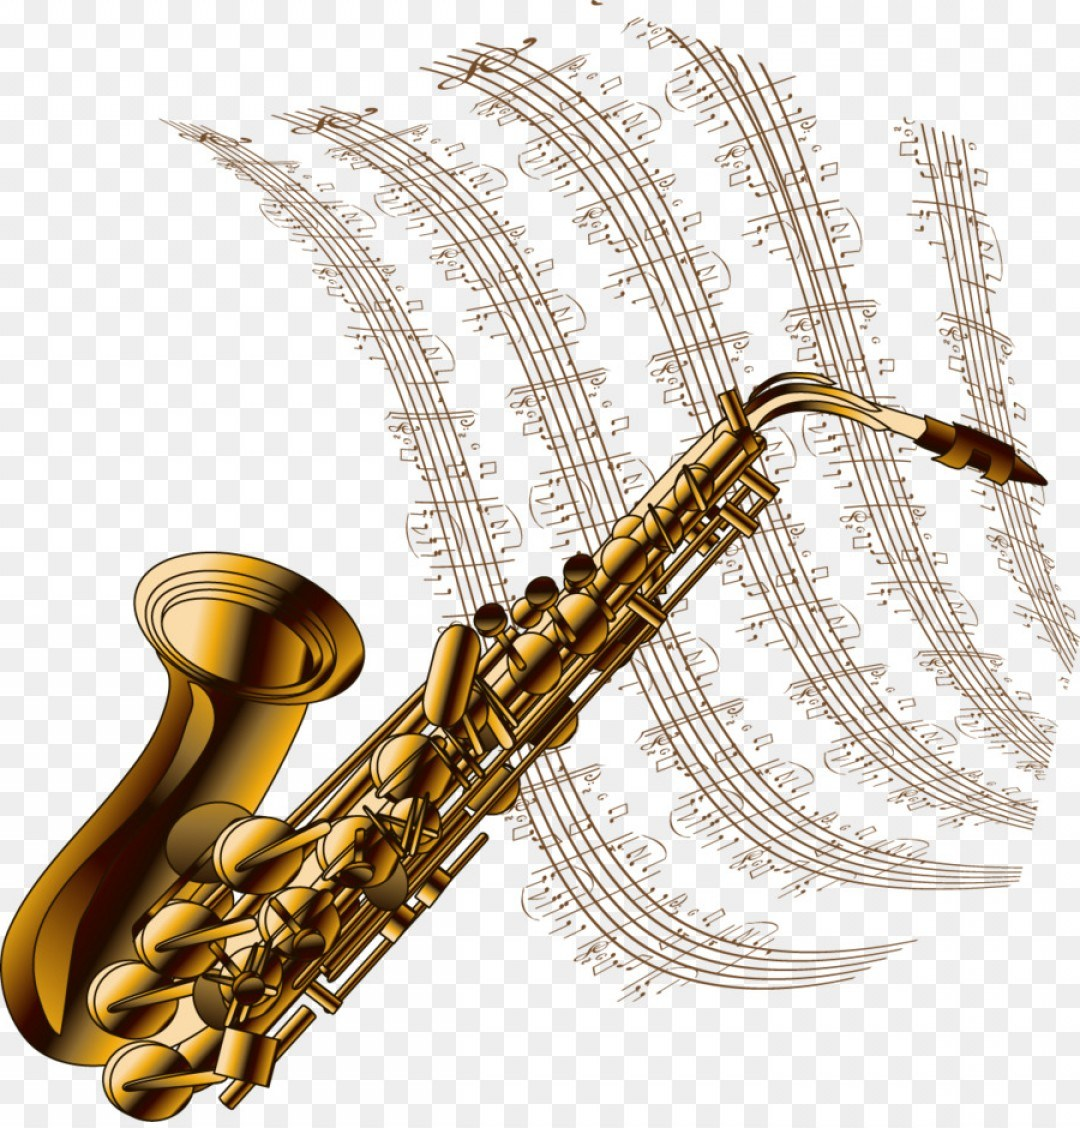 1080x1128 Jazz Drawing Saxophone Pencil